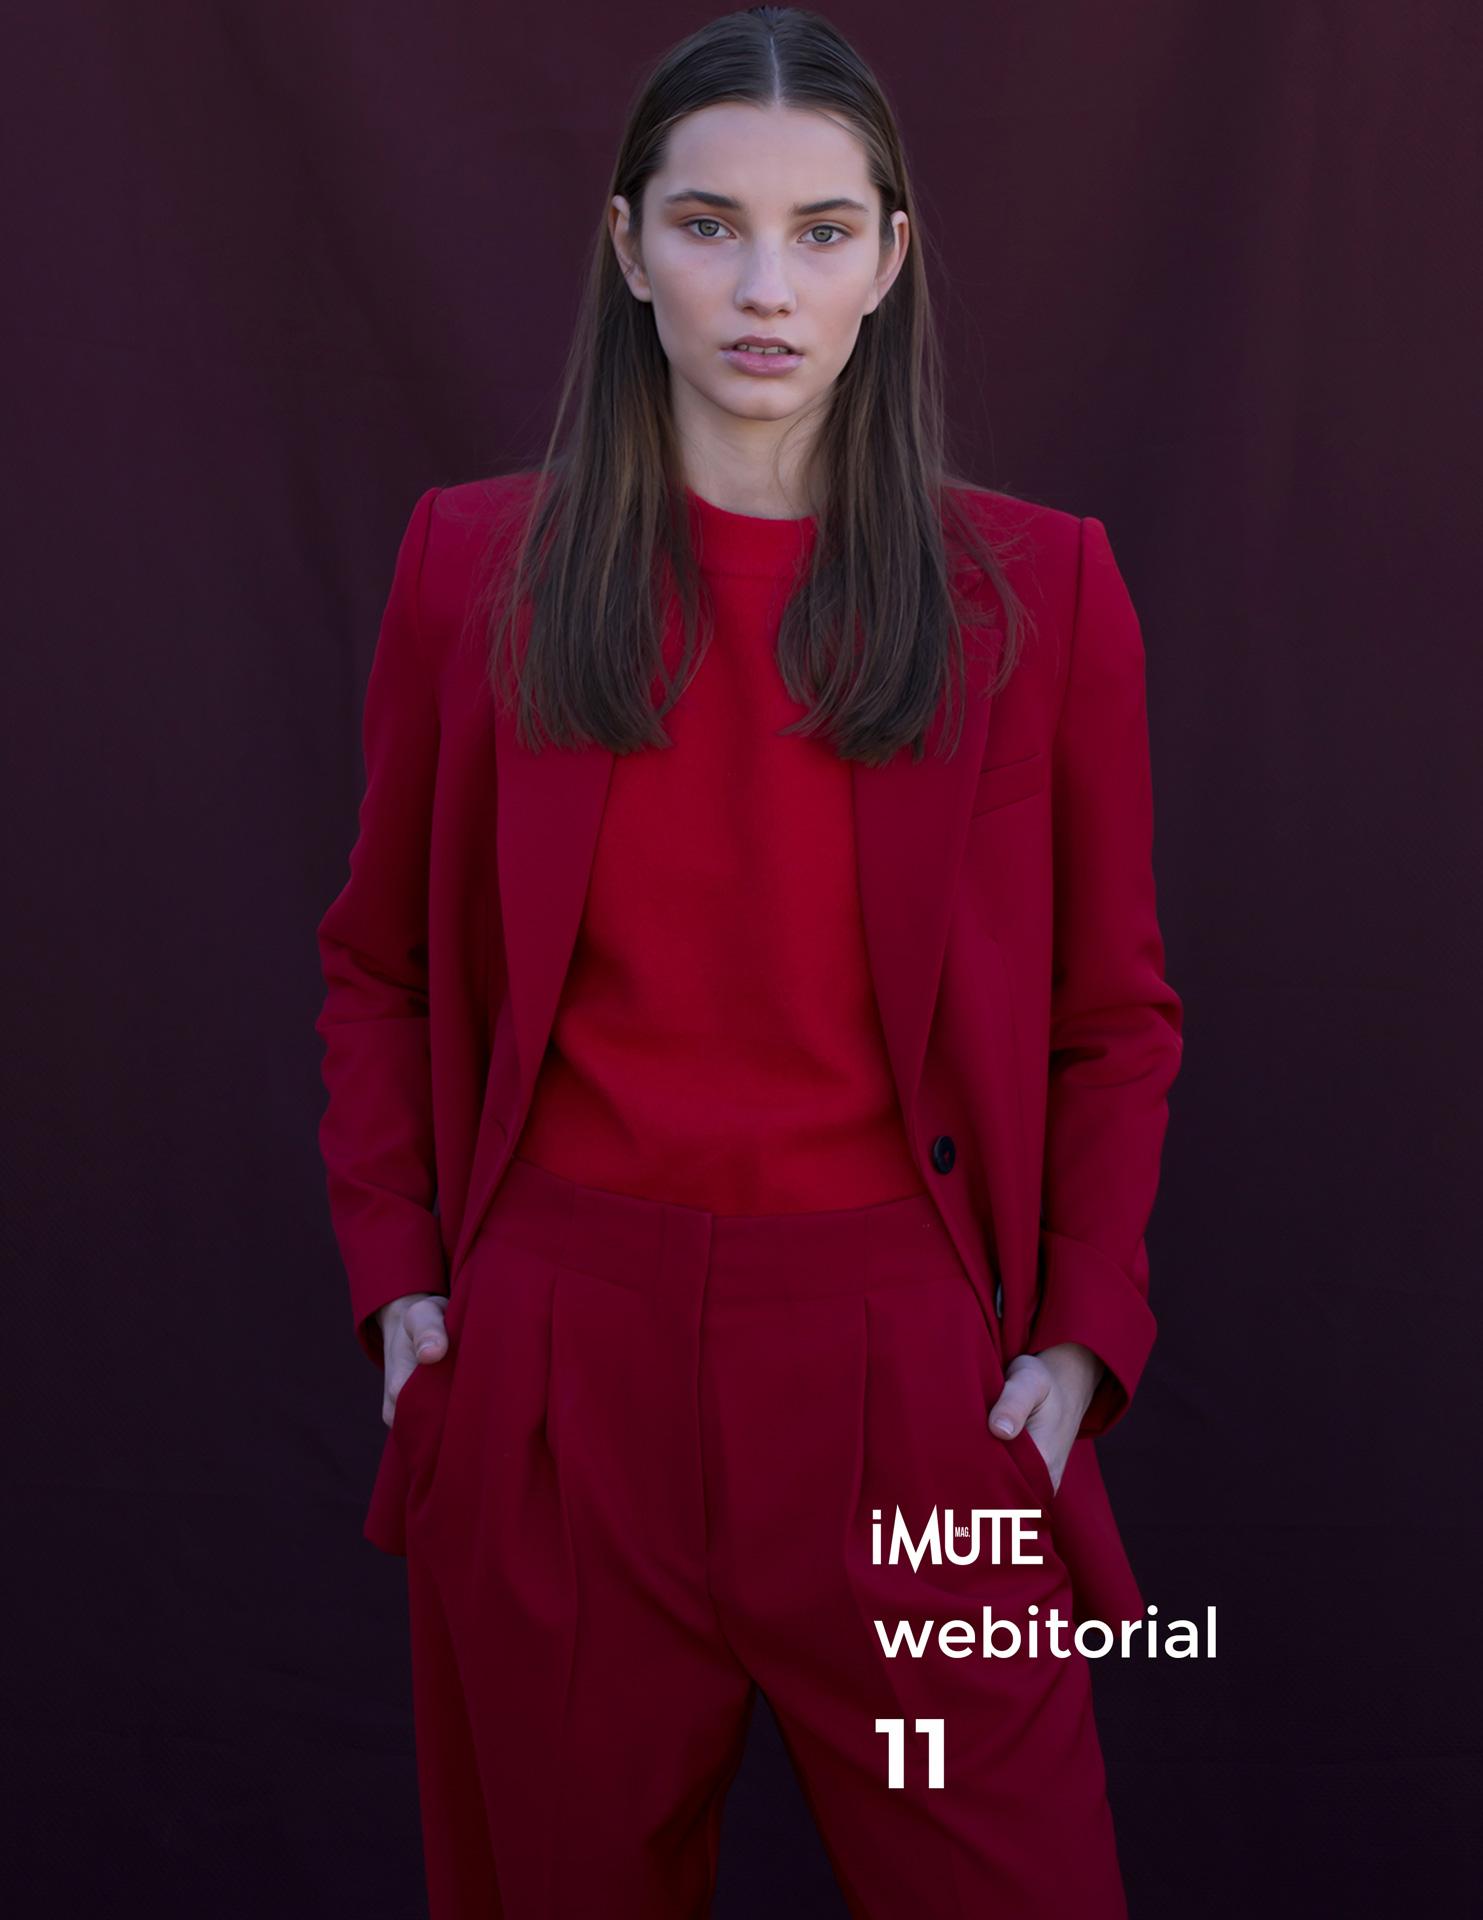 air webitorial for iMute Magazine Photographer & Stylist|Simone Siel Model| Santa @Fifth Avenue Model Management Makeup & Hair|Yuliya